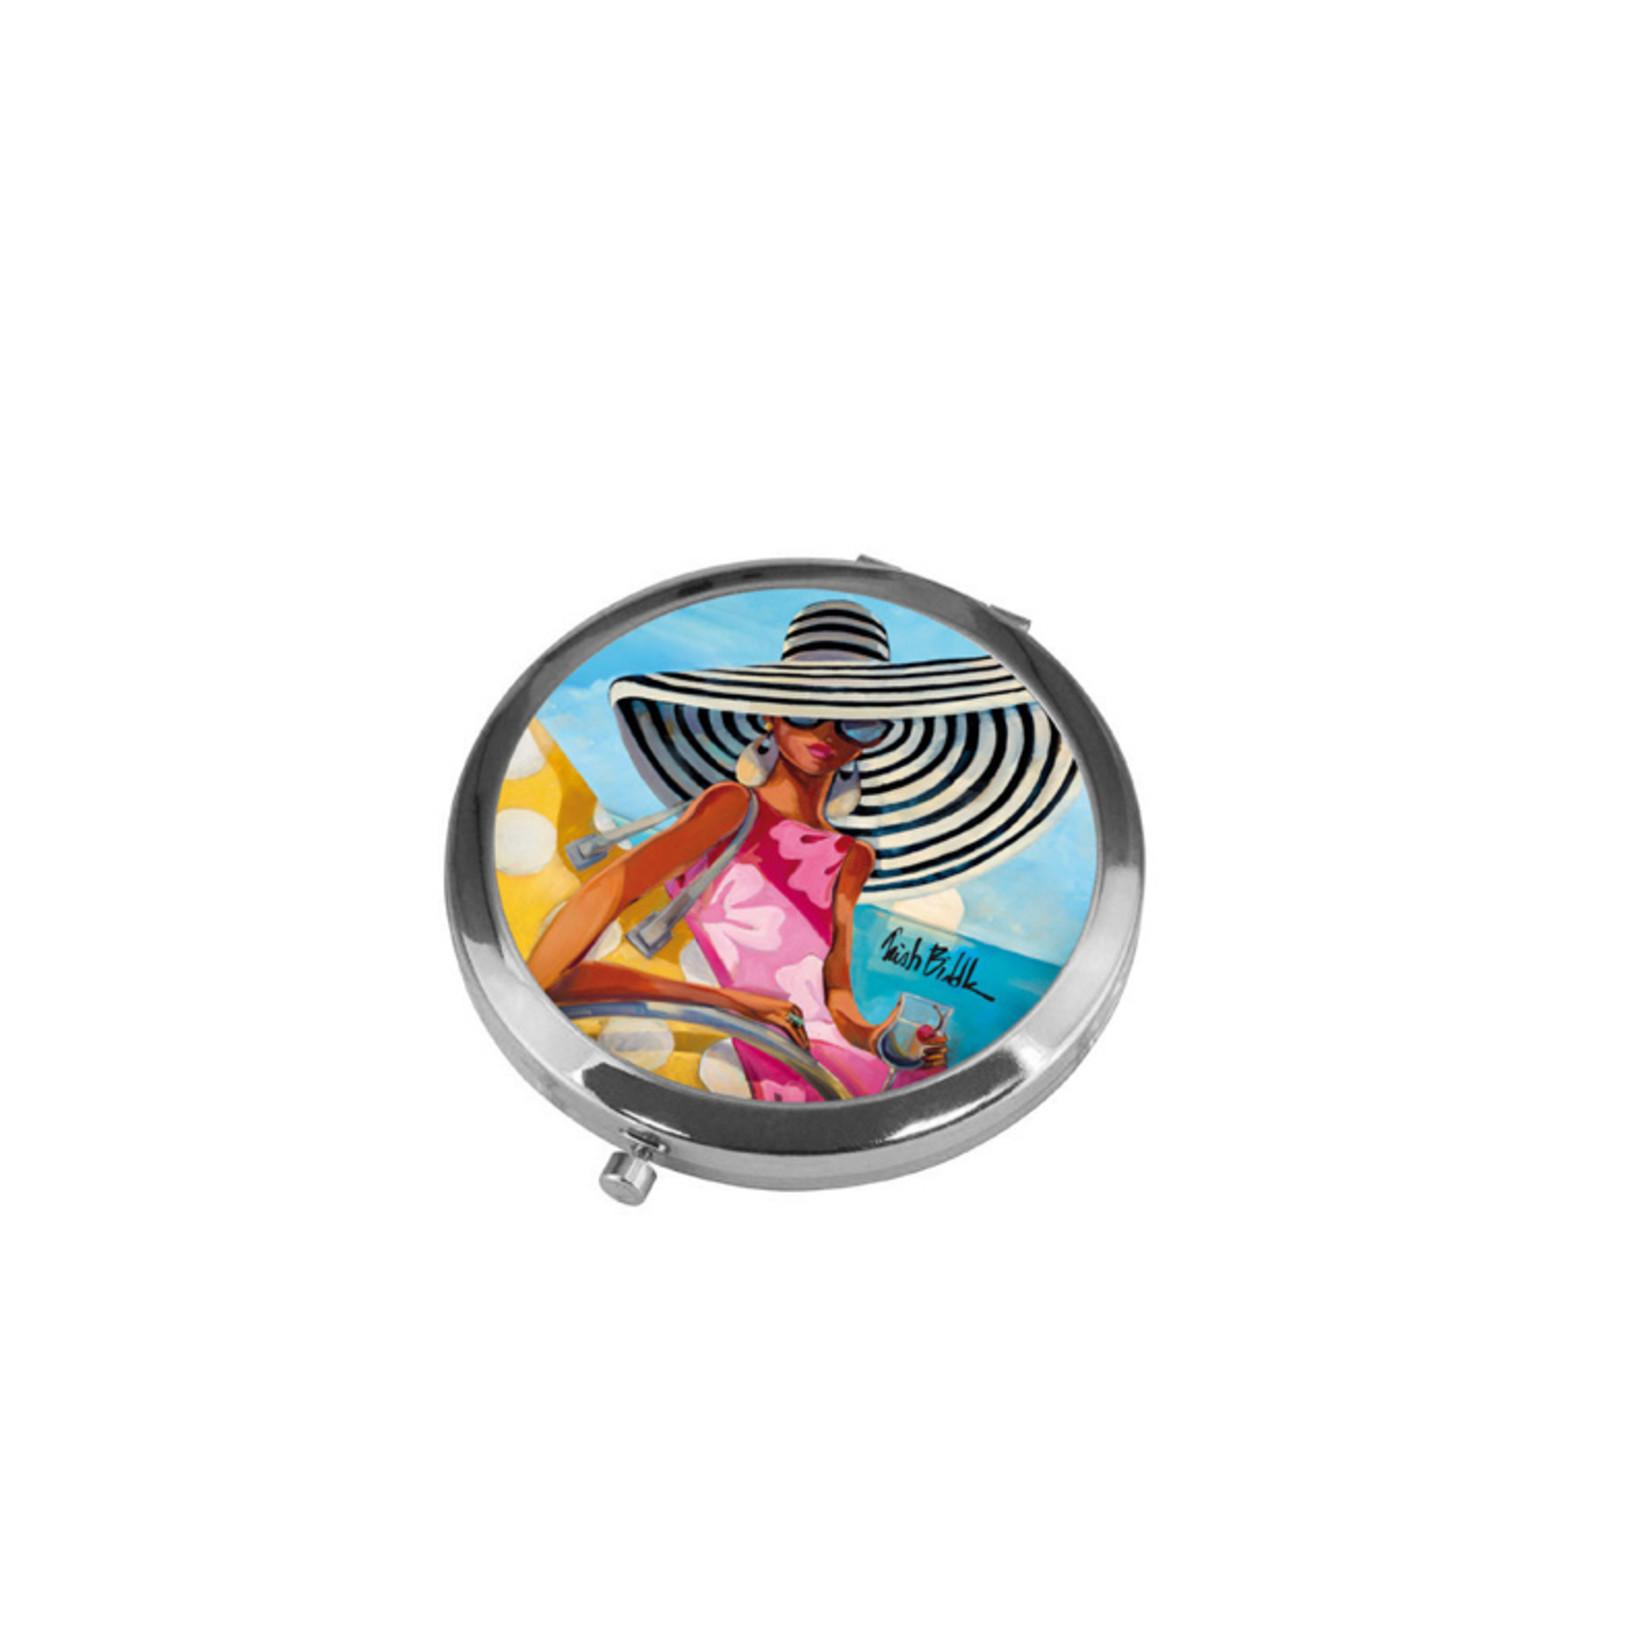 Goebel Porzellanmanufaktur Taschenspiegel Summer Girl | Trish Biddle | Goebel Porzellan